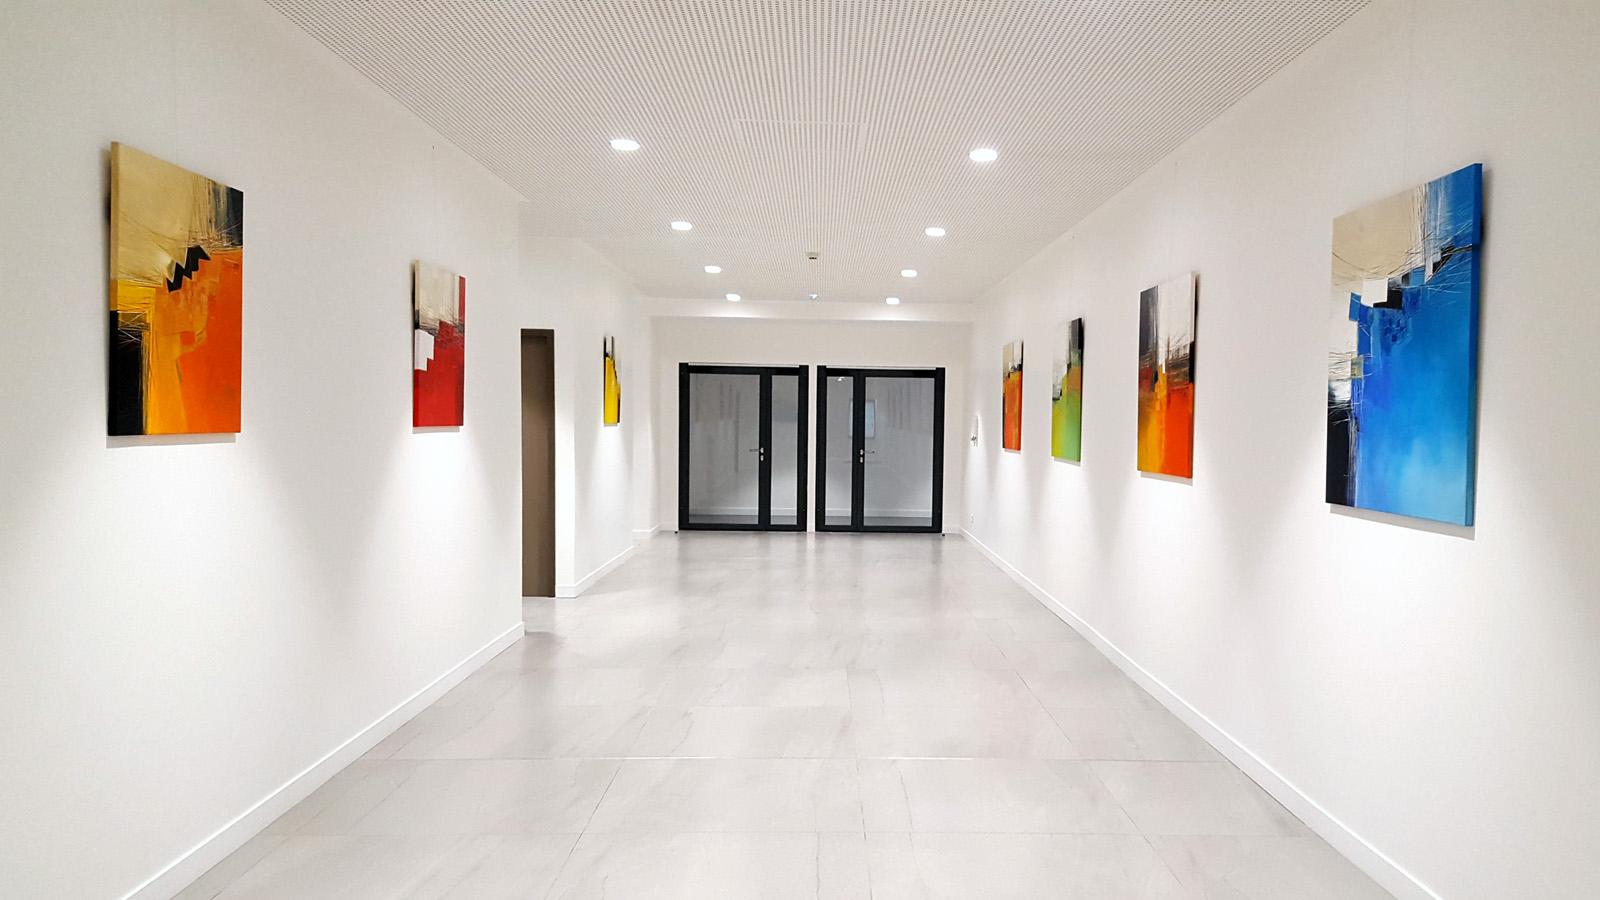 Contemporary Abstract Art Exhibition